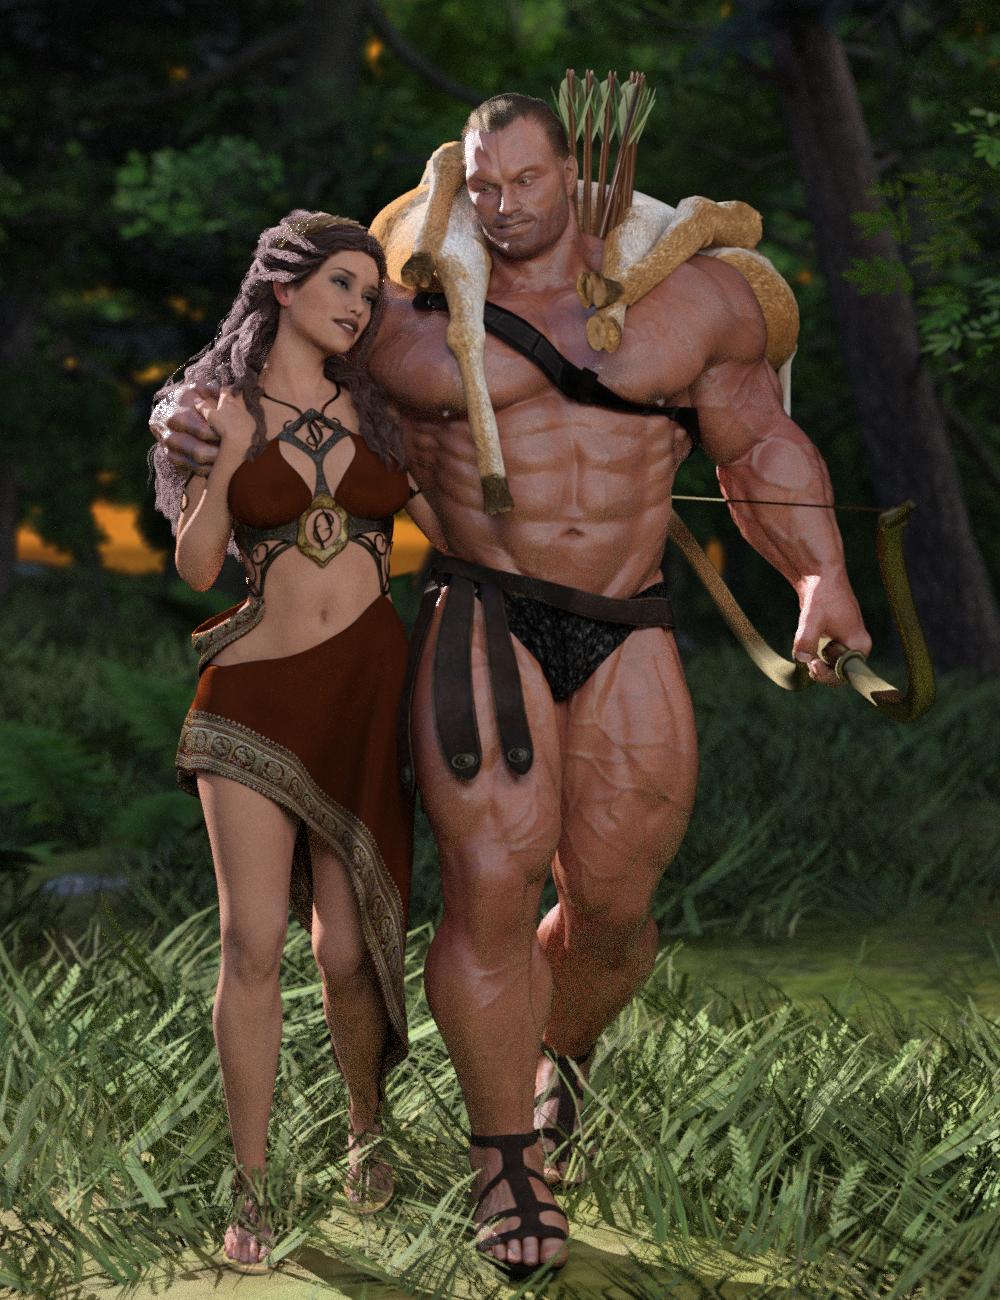 Hercules and Deianira by SimonWM on DeviantArt